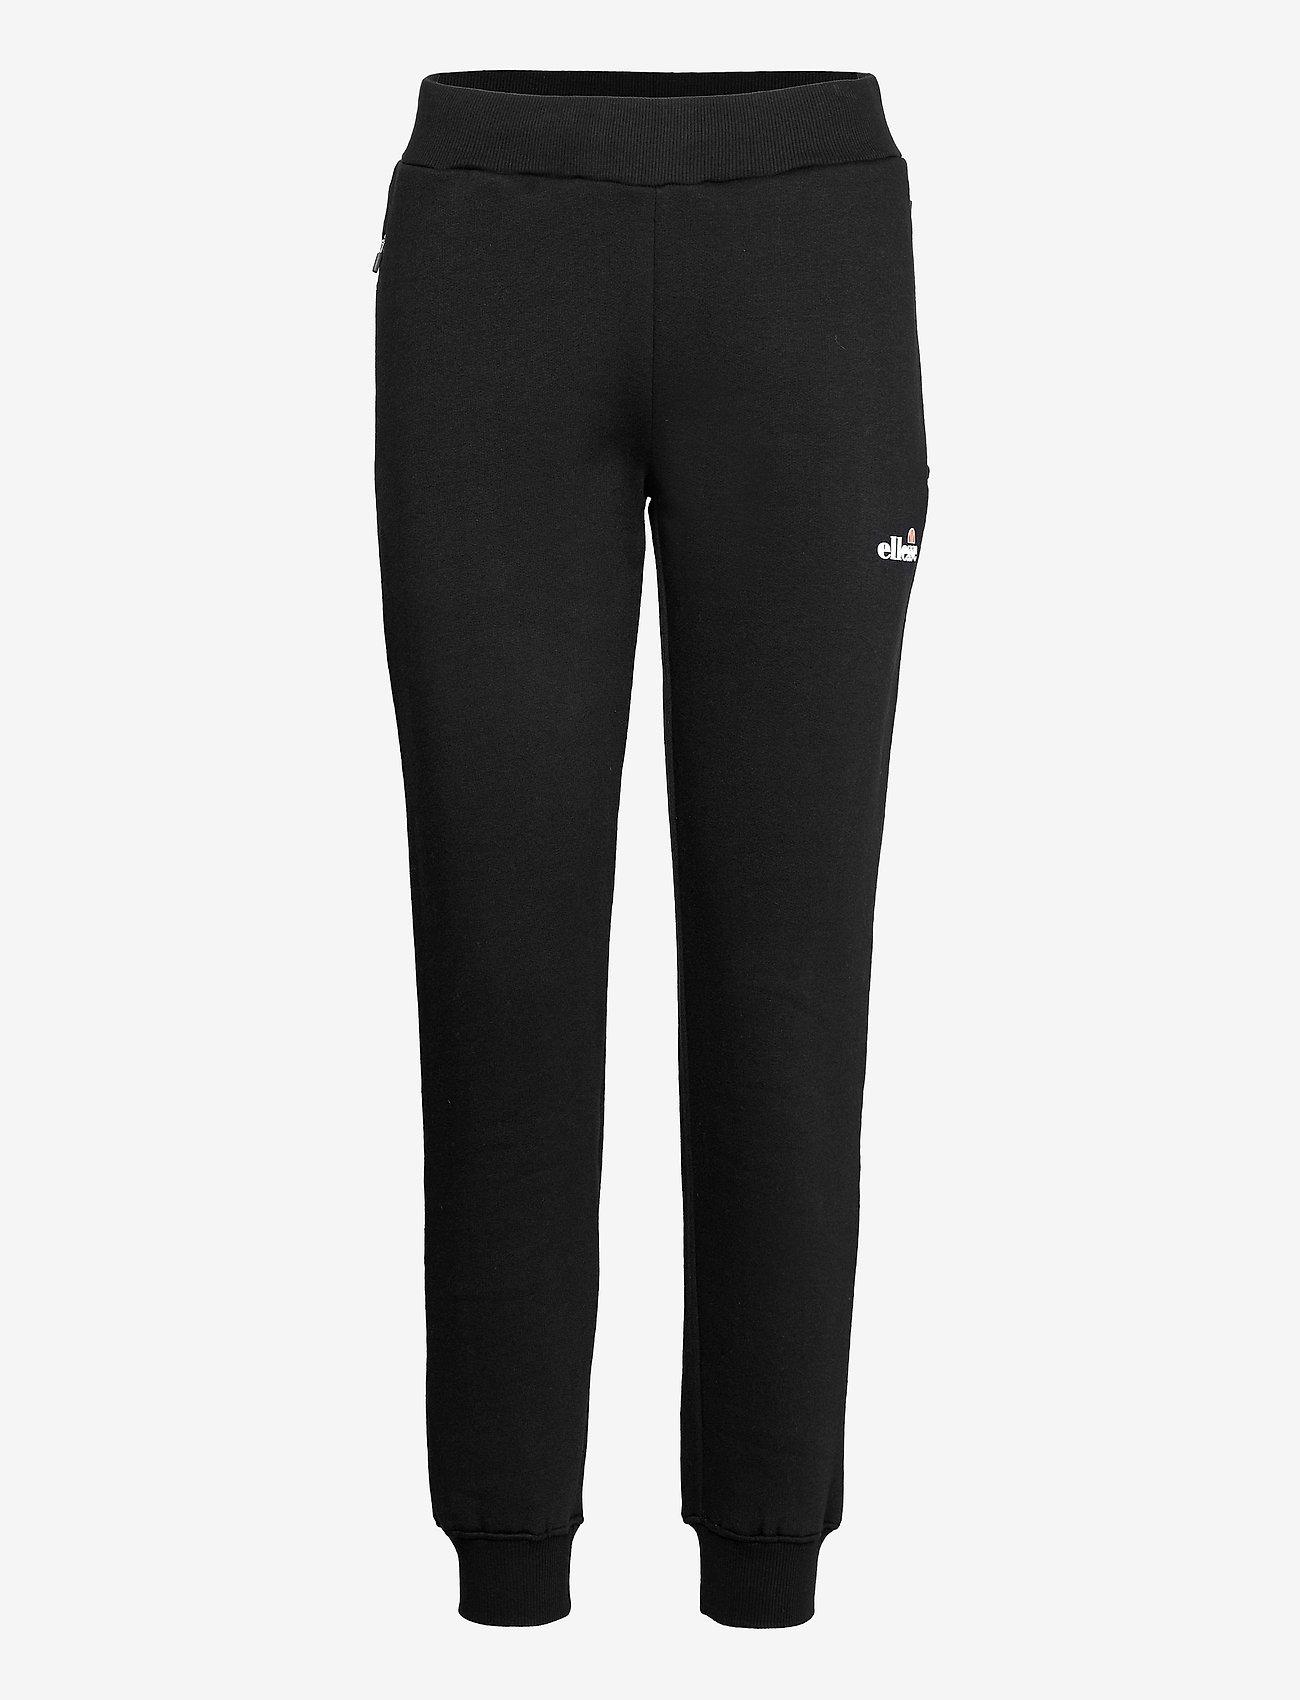 Ellesse - EL AFRILE JOGPANT - pants - black - 0